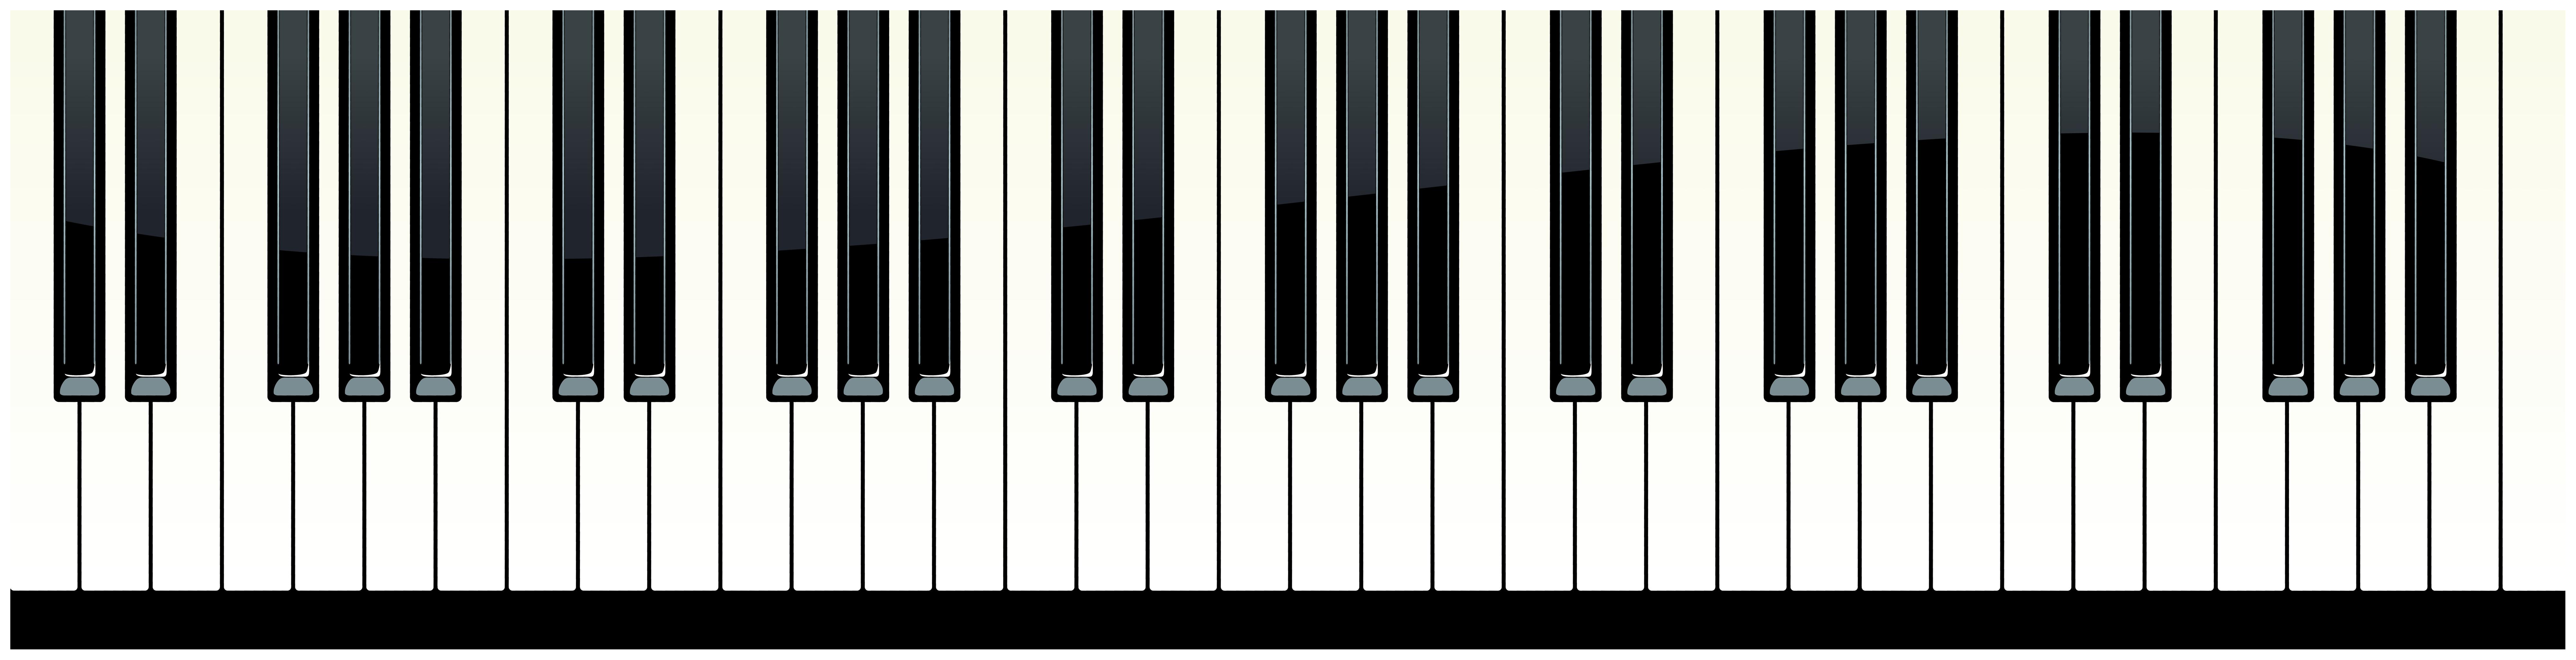 Free clipart piano keys. Png clip art image